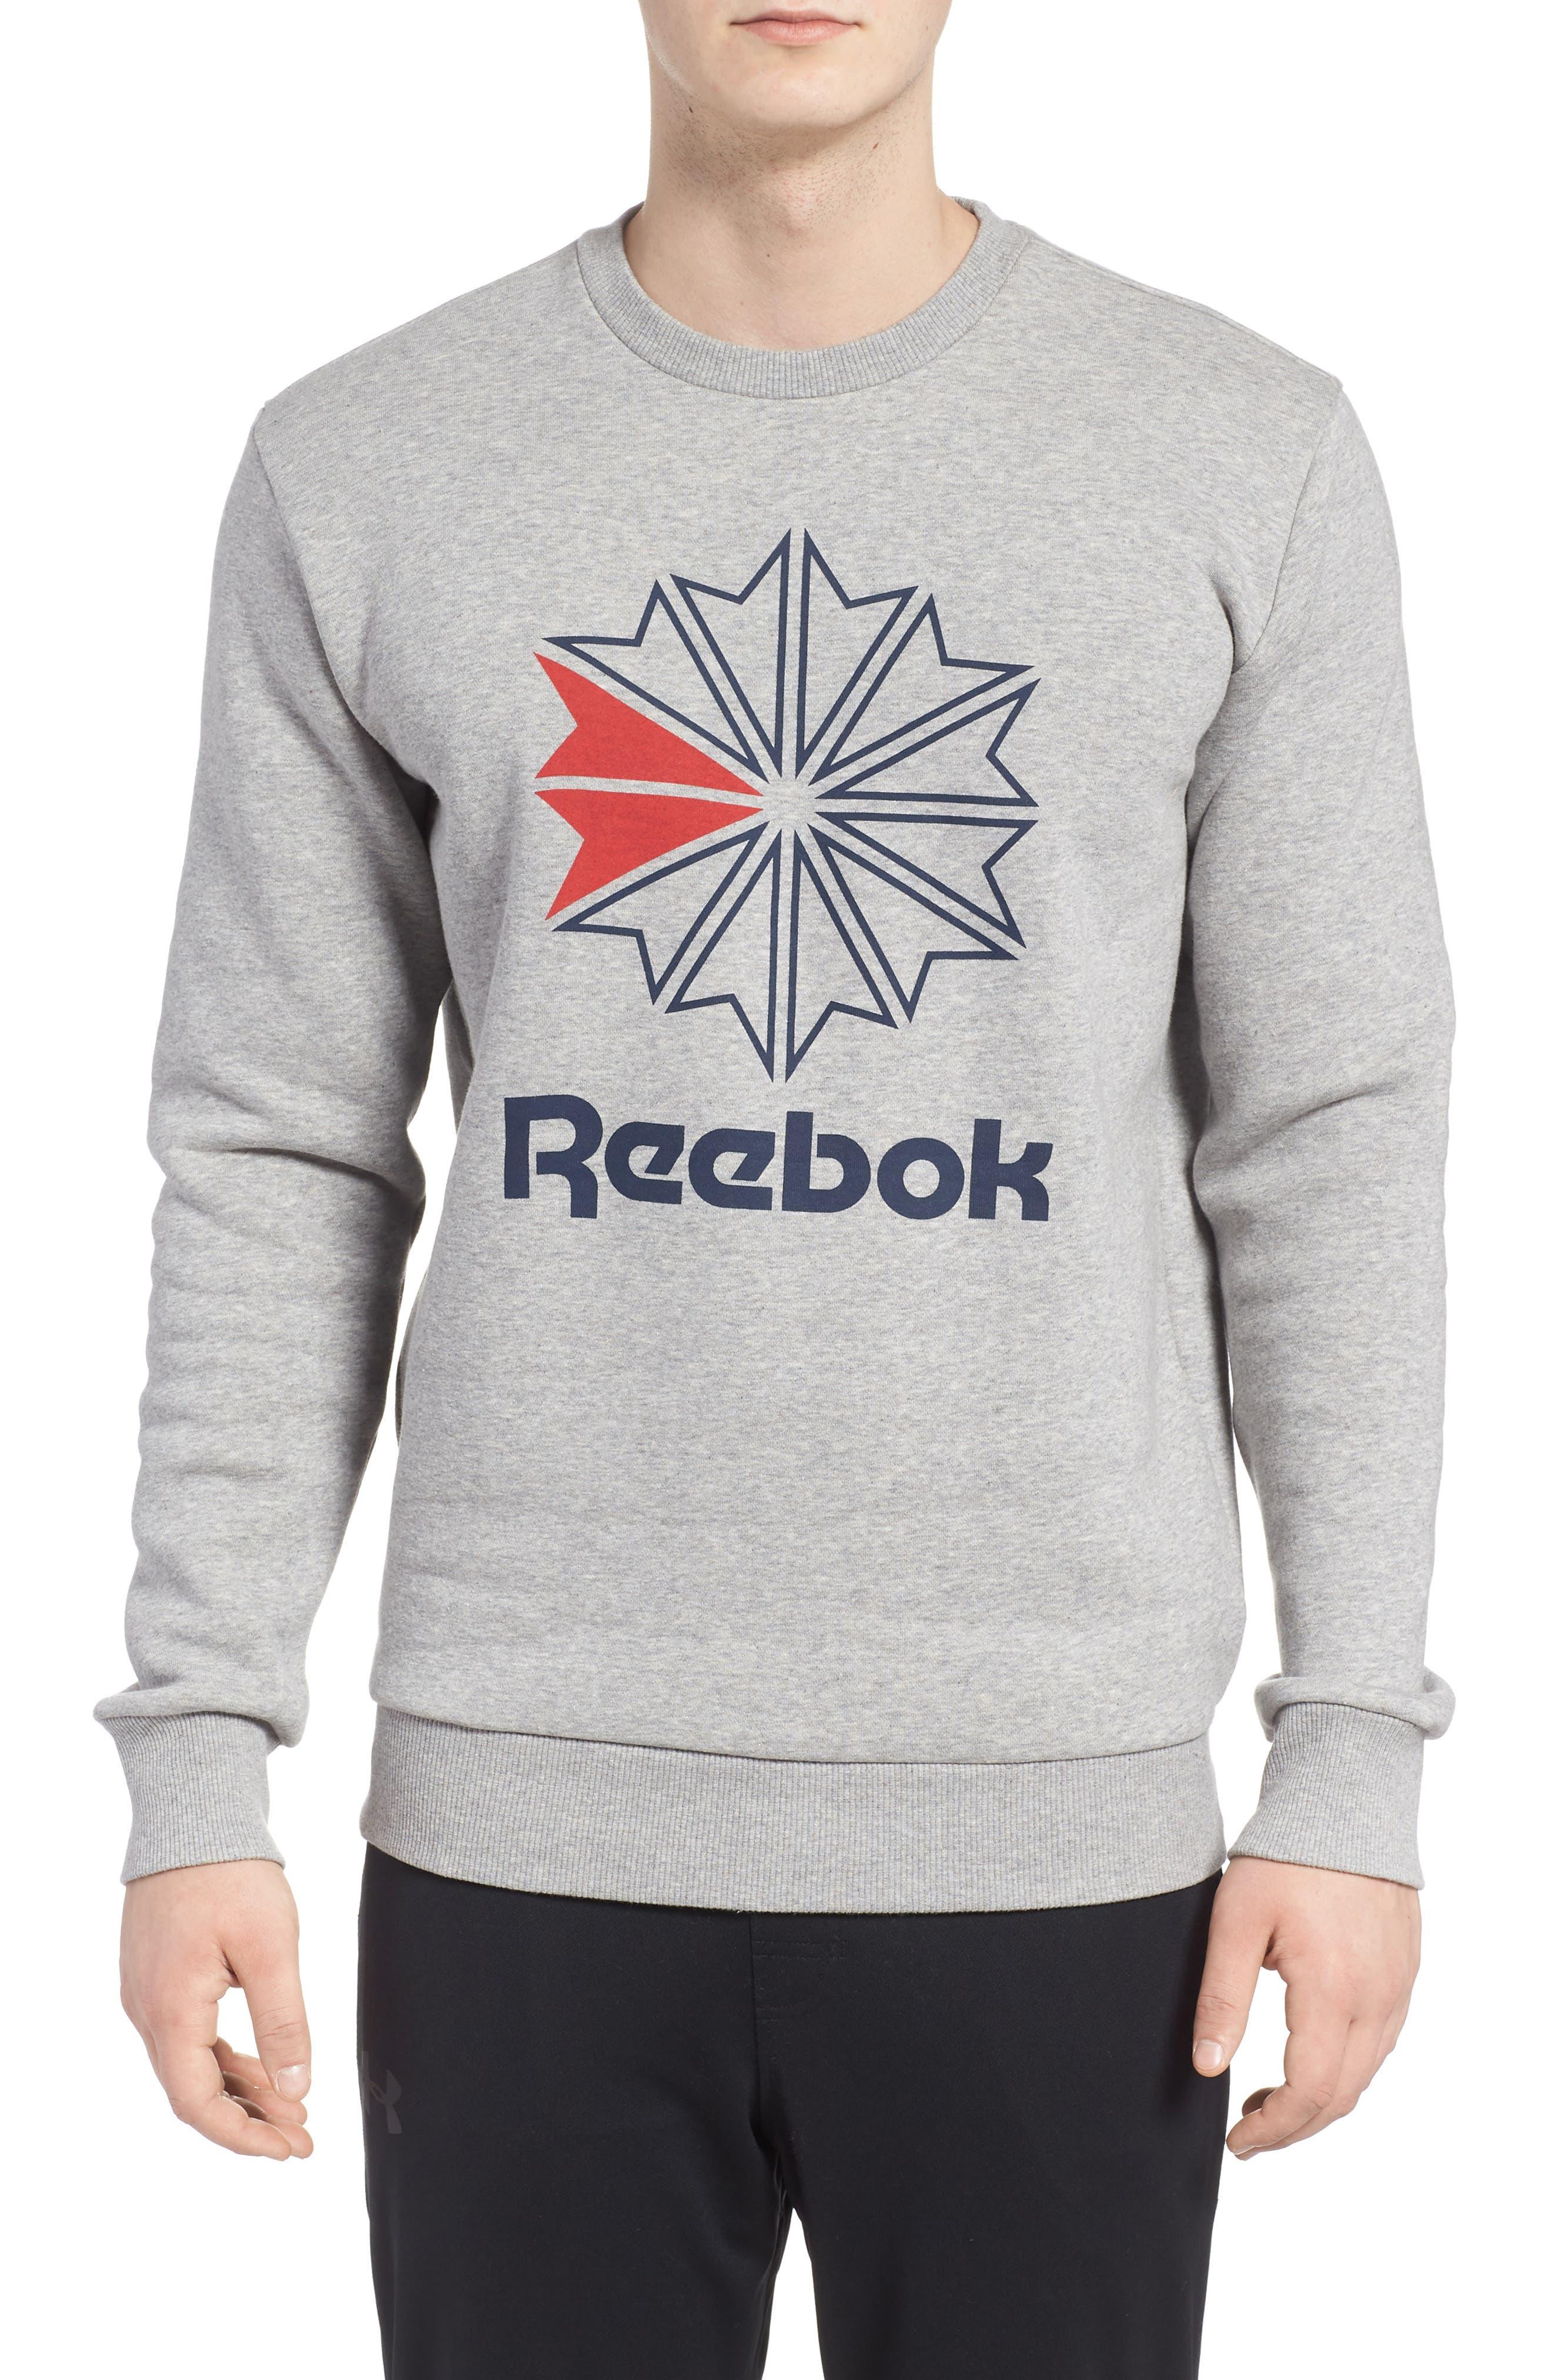 Reebok Starcrest Sweatshirt